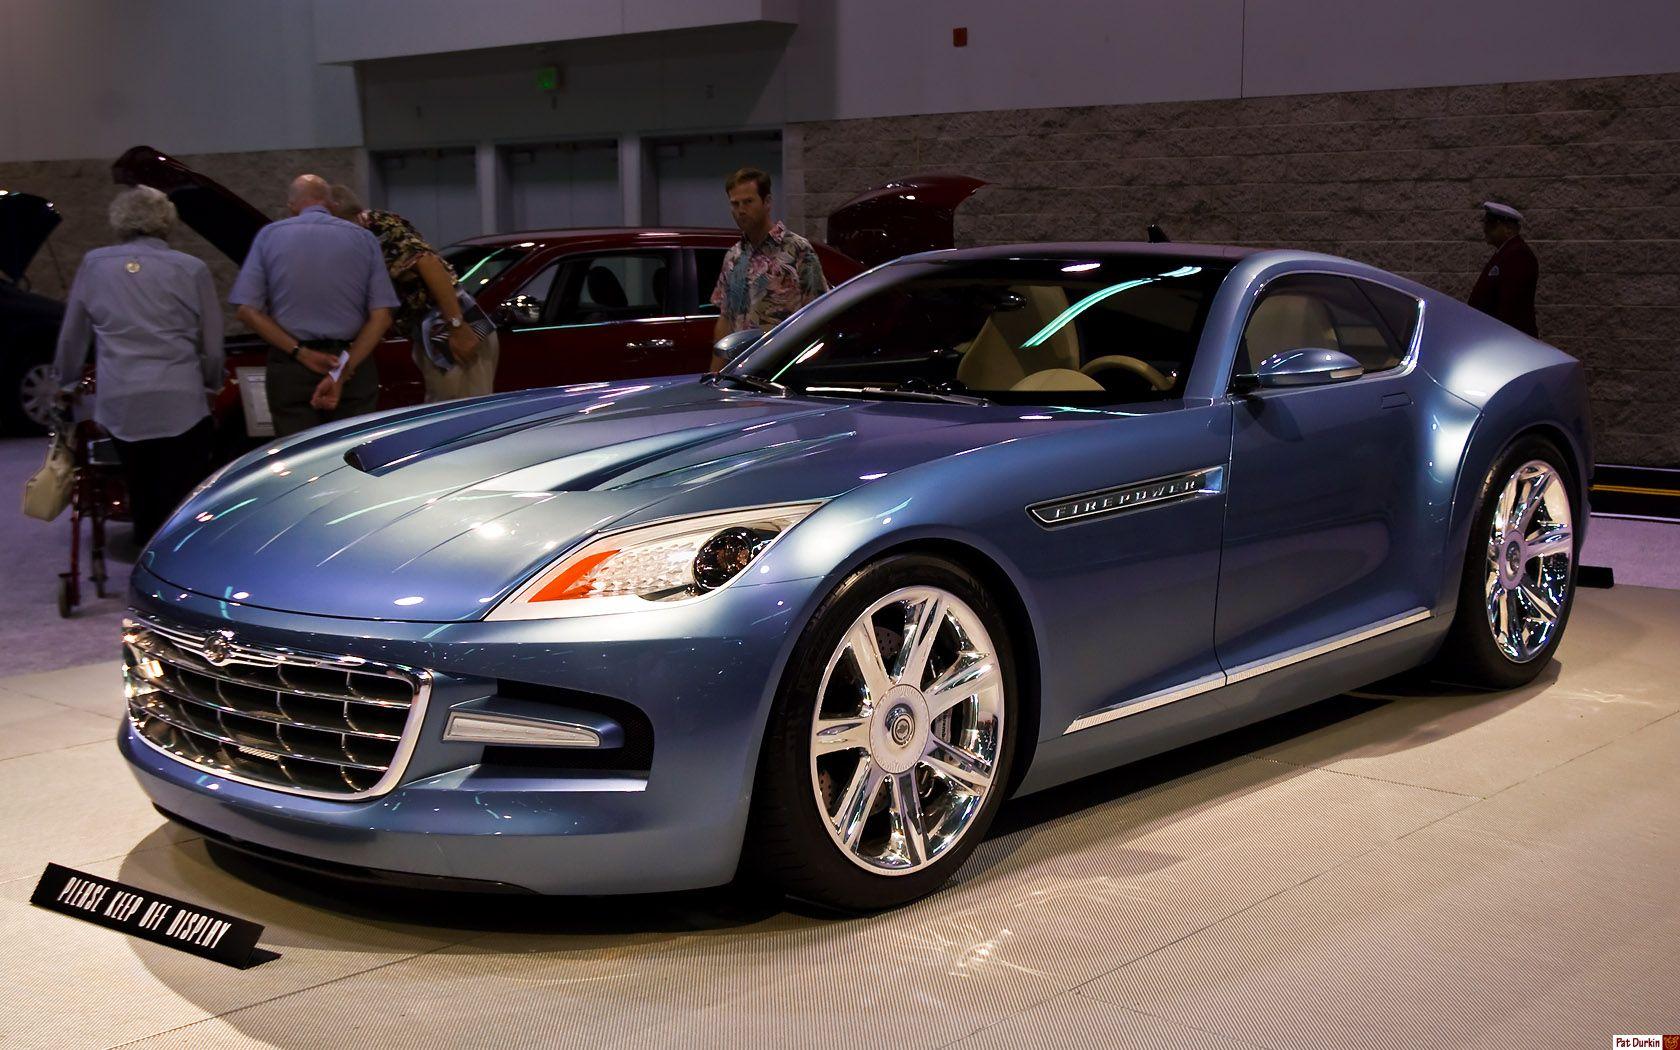 Chrysler Firepower The Viper Based Concept That Looks Like An